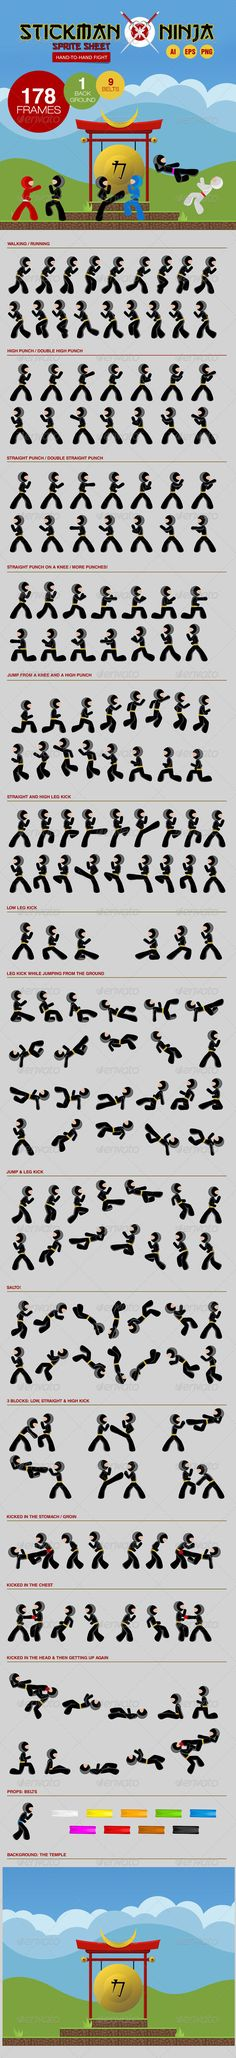 Stickman Ninja Sprite Sheet - Hand-To-Hand Fight - Sprites Game Assets